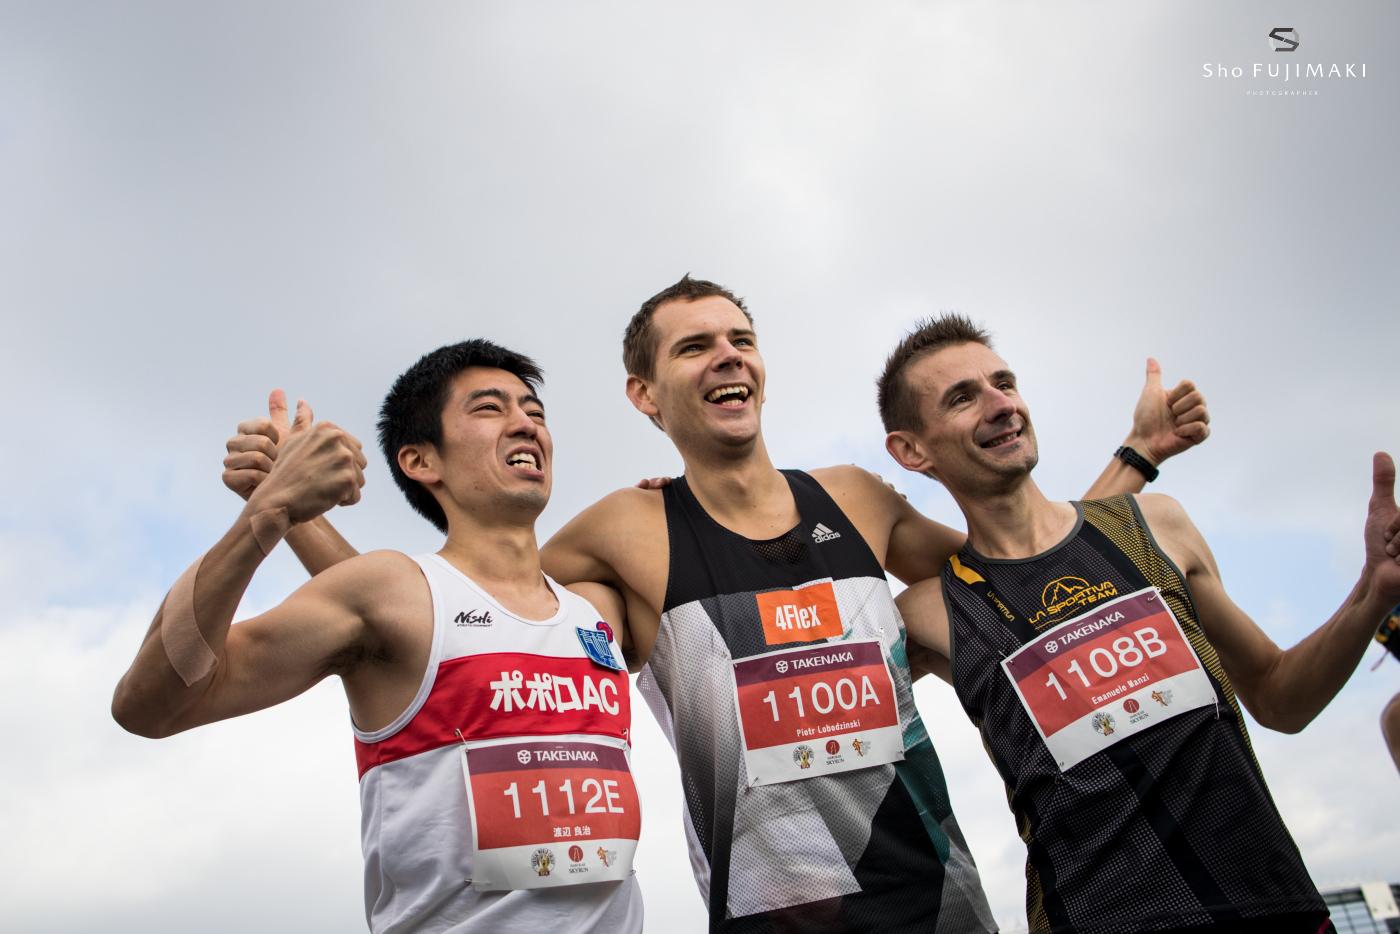 Men's podium, Ryoji Watanabe 3rd, Piotr Lobodzinski, winner, Emanuele Manzi, 3rd. © Sho Fujimaki